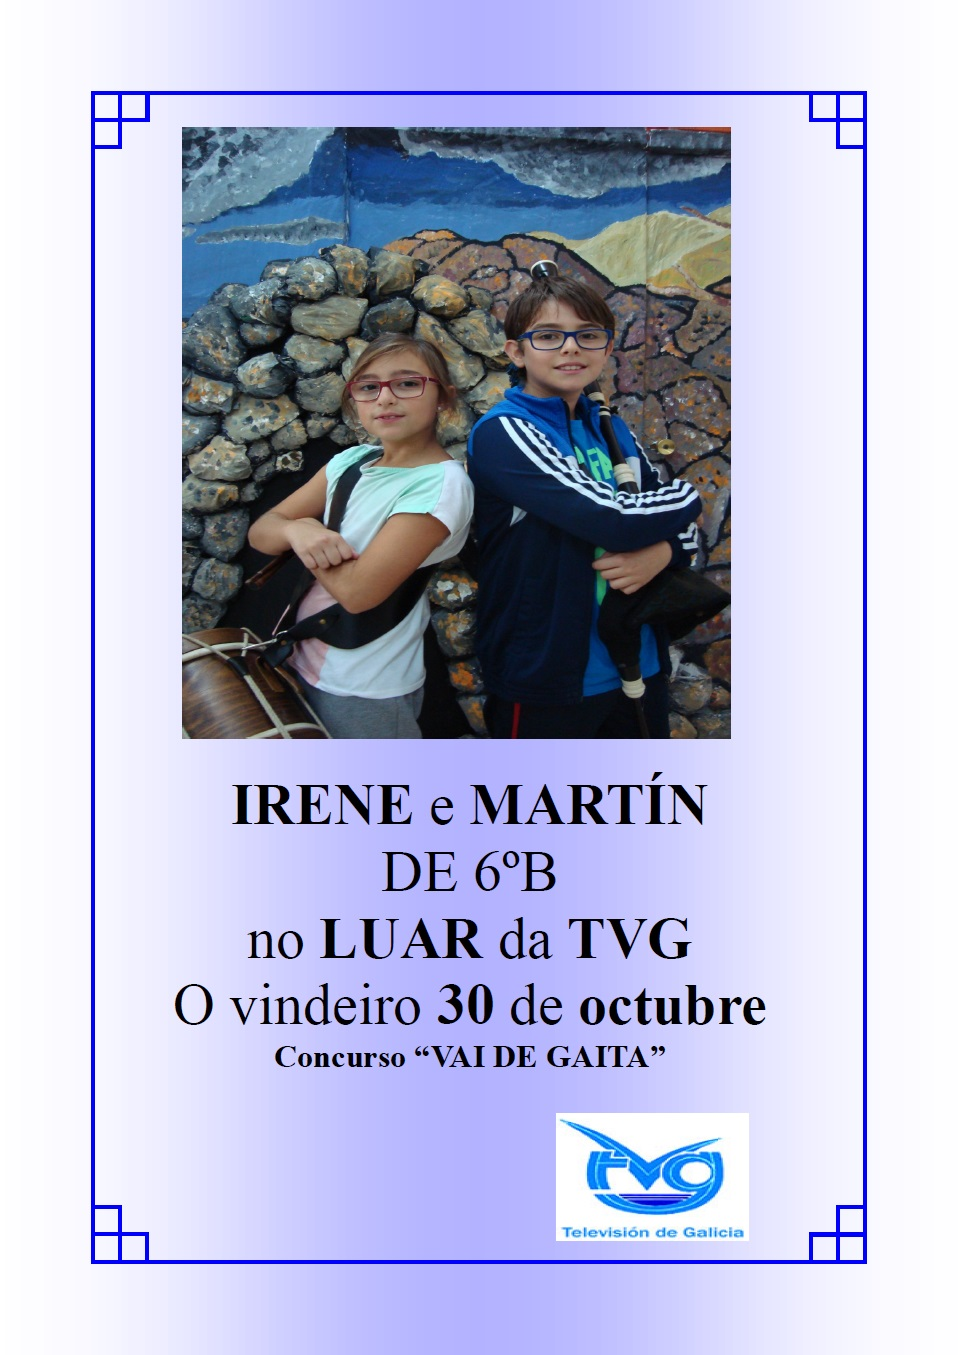 Martín e Irene no LUAR da TVG!!!